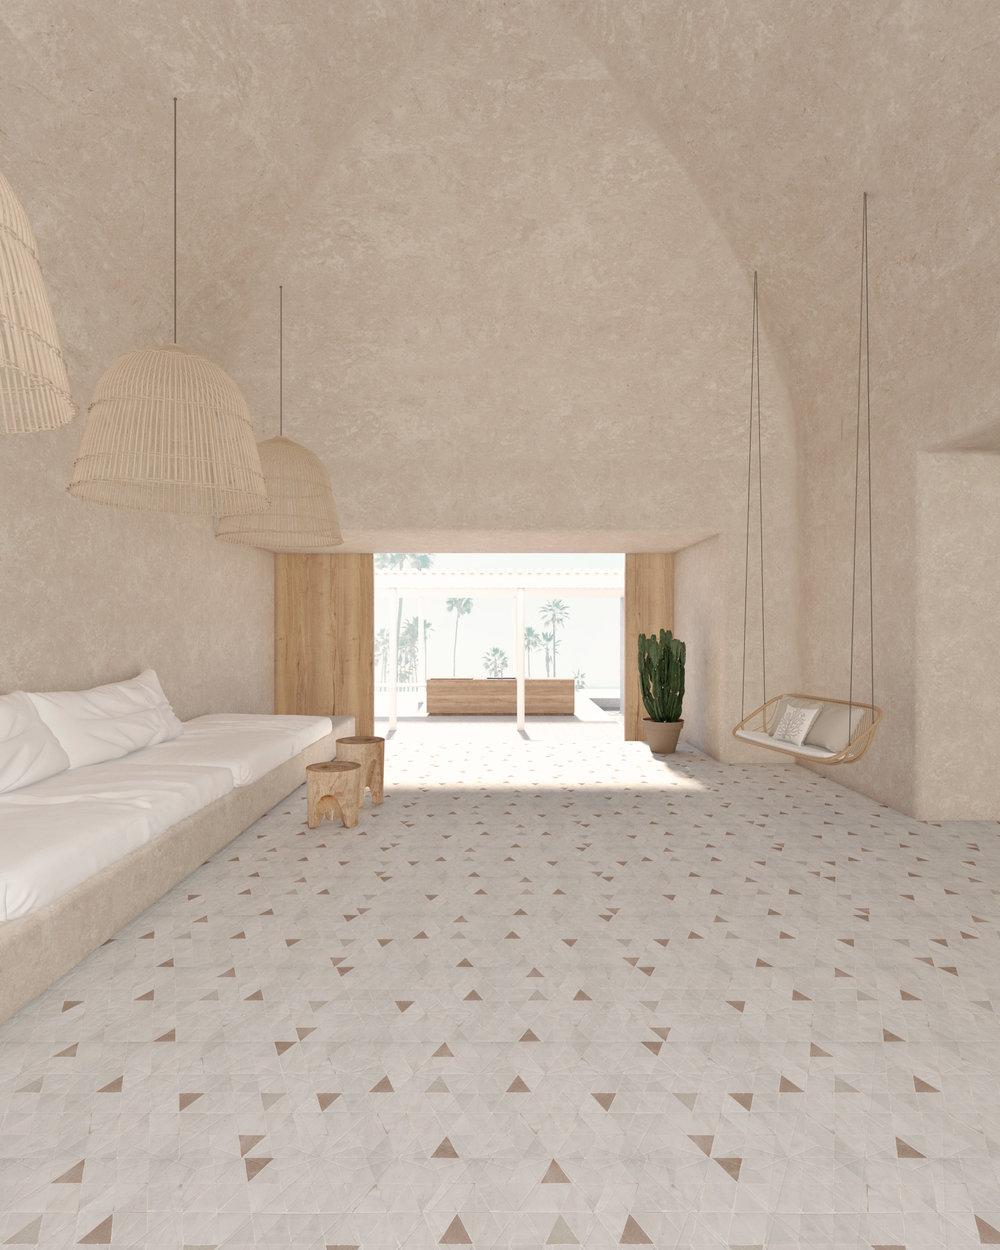 02_piscina_mediterraneo_atelier_zeliji_maioliche_stucco_ayilluminate_paolalenti_swing_altalena_internoesterno_spaziomateriae_interiordesign_napoli_photo.jpg